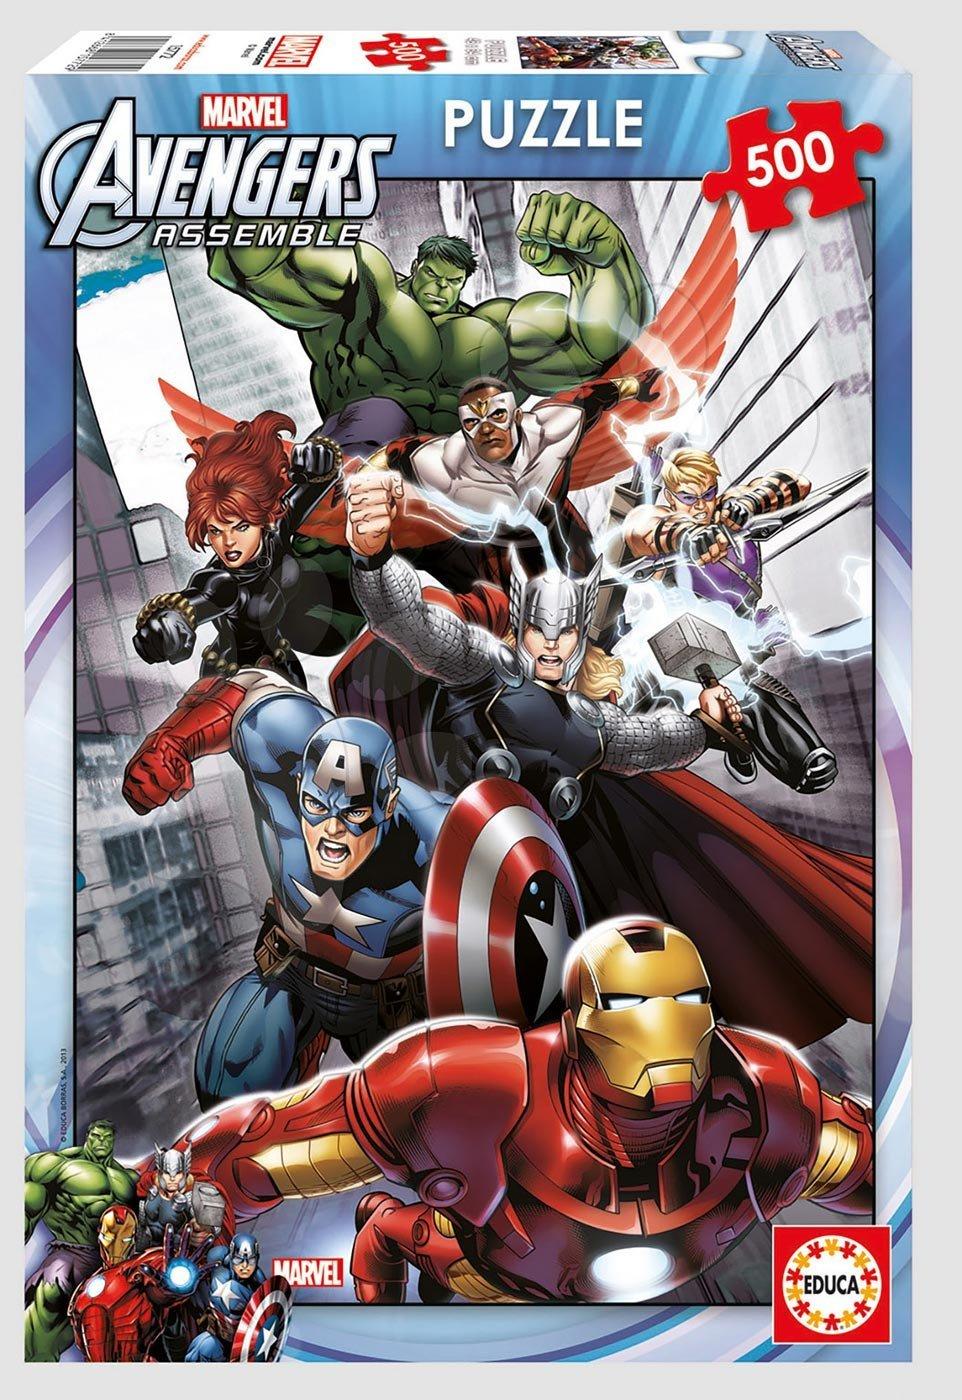 Puzzle 500 dielne - Puzzle Marvel Avengers Educa 500 dielov od 11 rokov